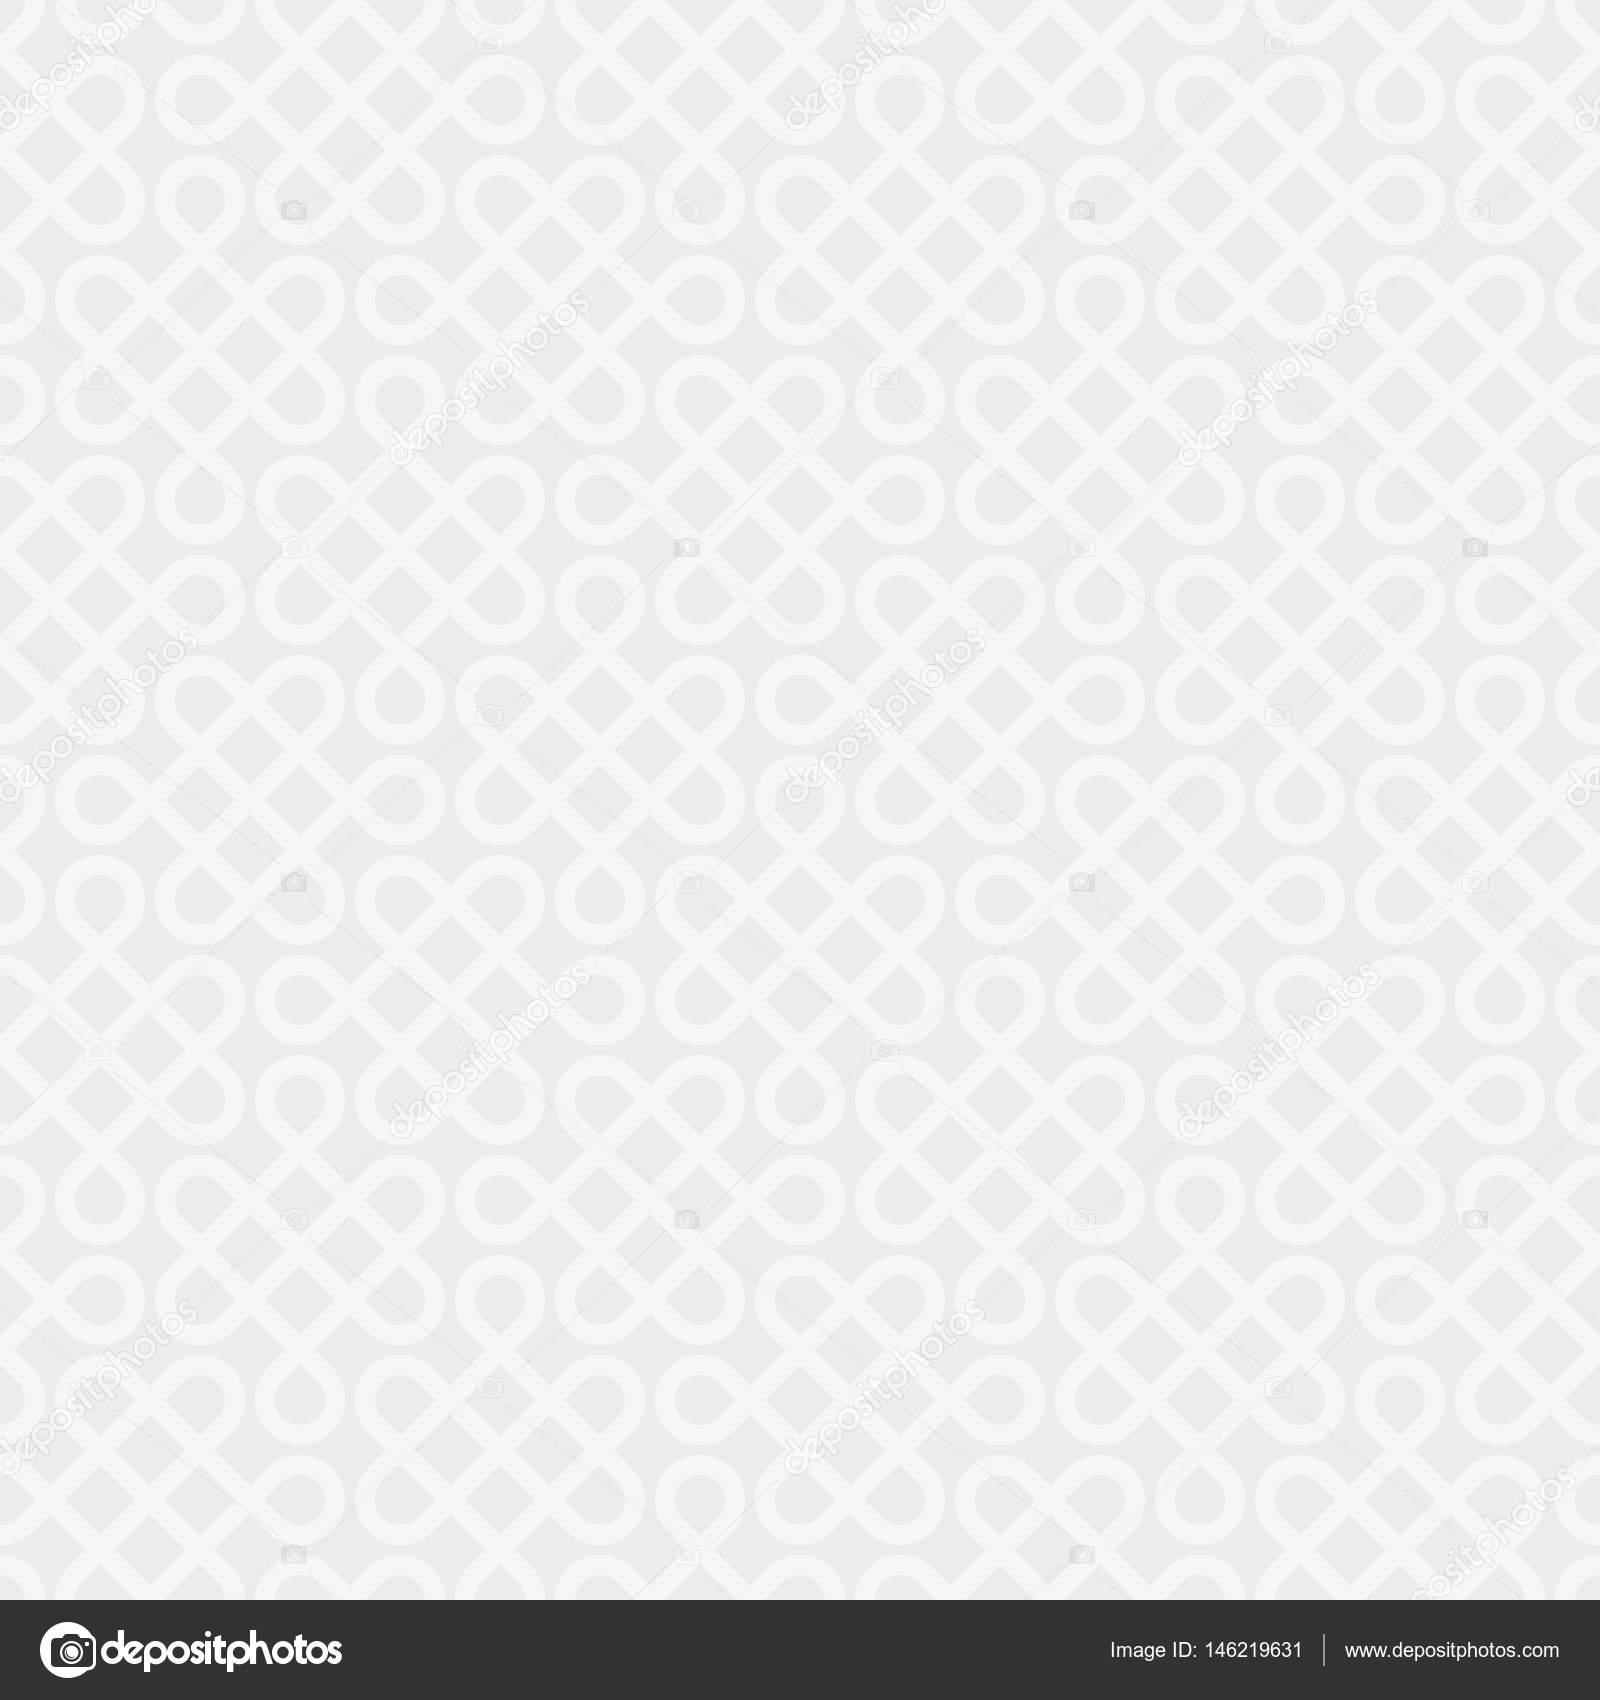 Celtic Knotwork Wallpaper Neutral Seamless Celtic Knotwork Pattern Stock Vector C Almagami 146219631